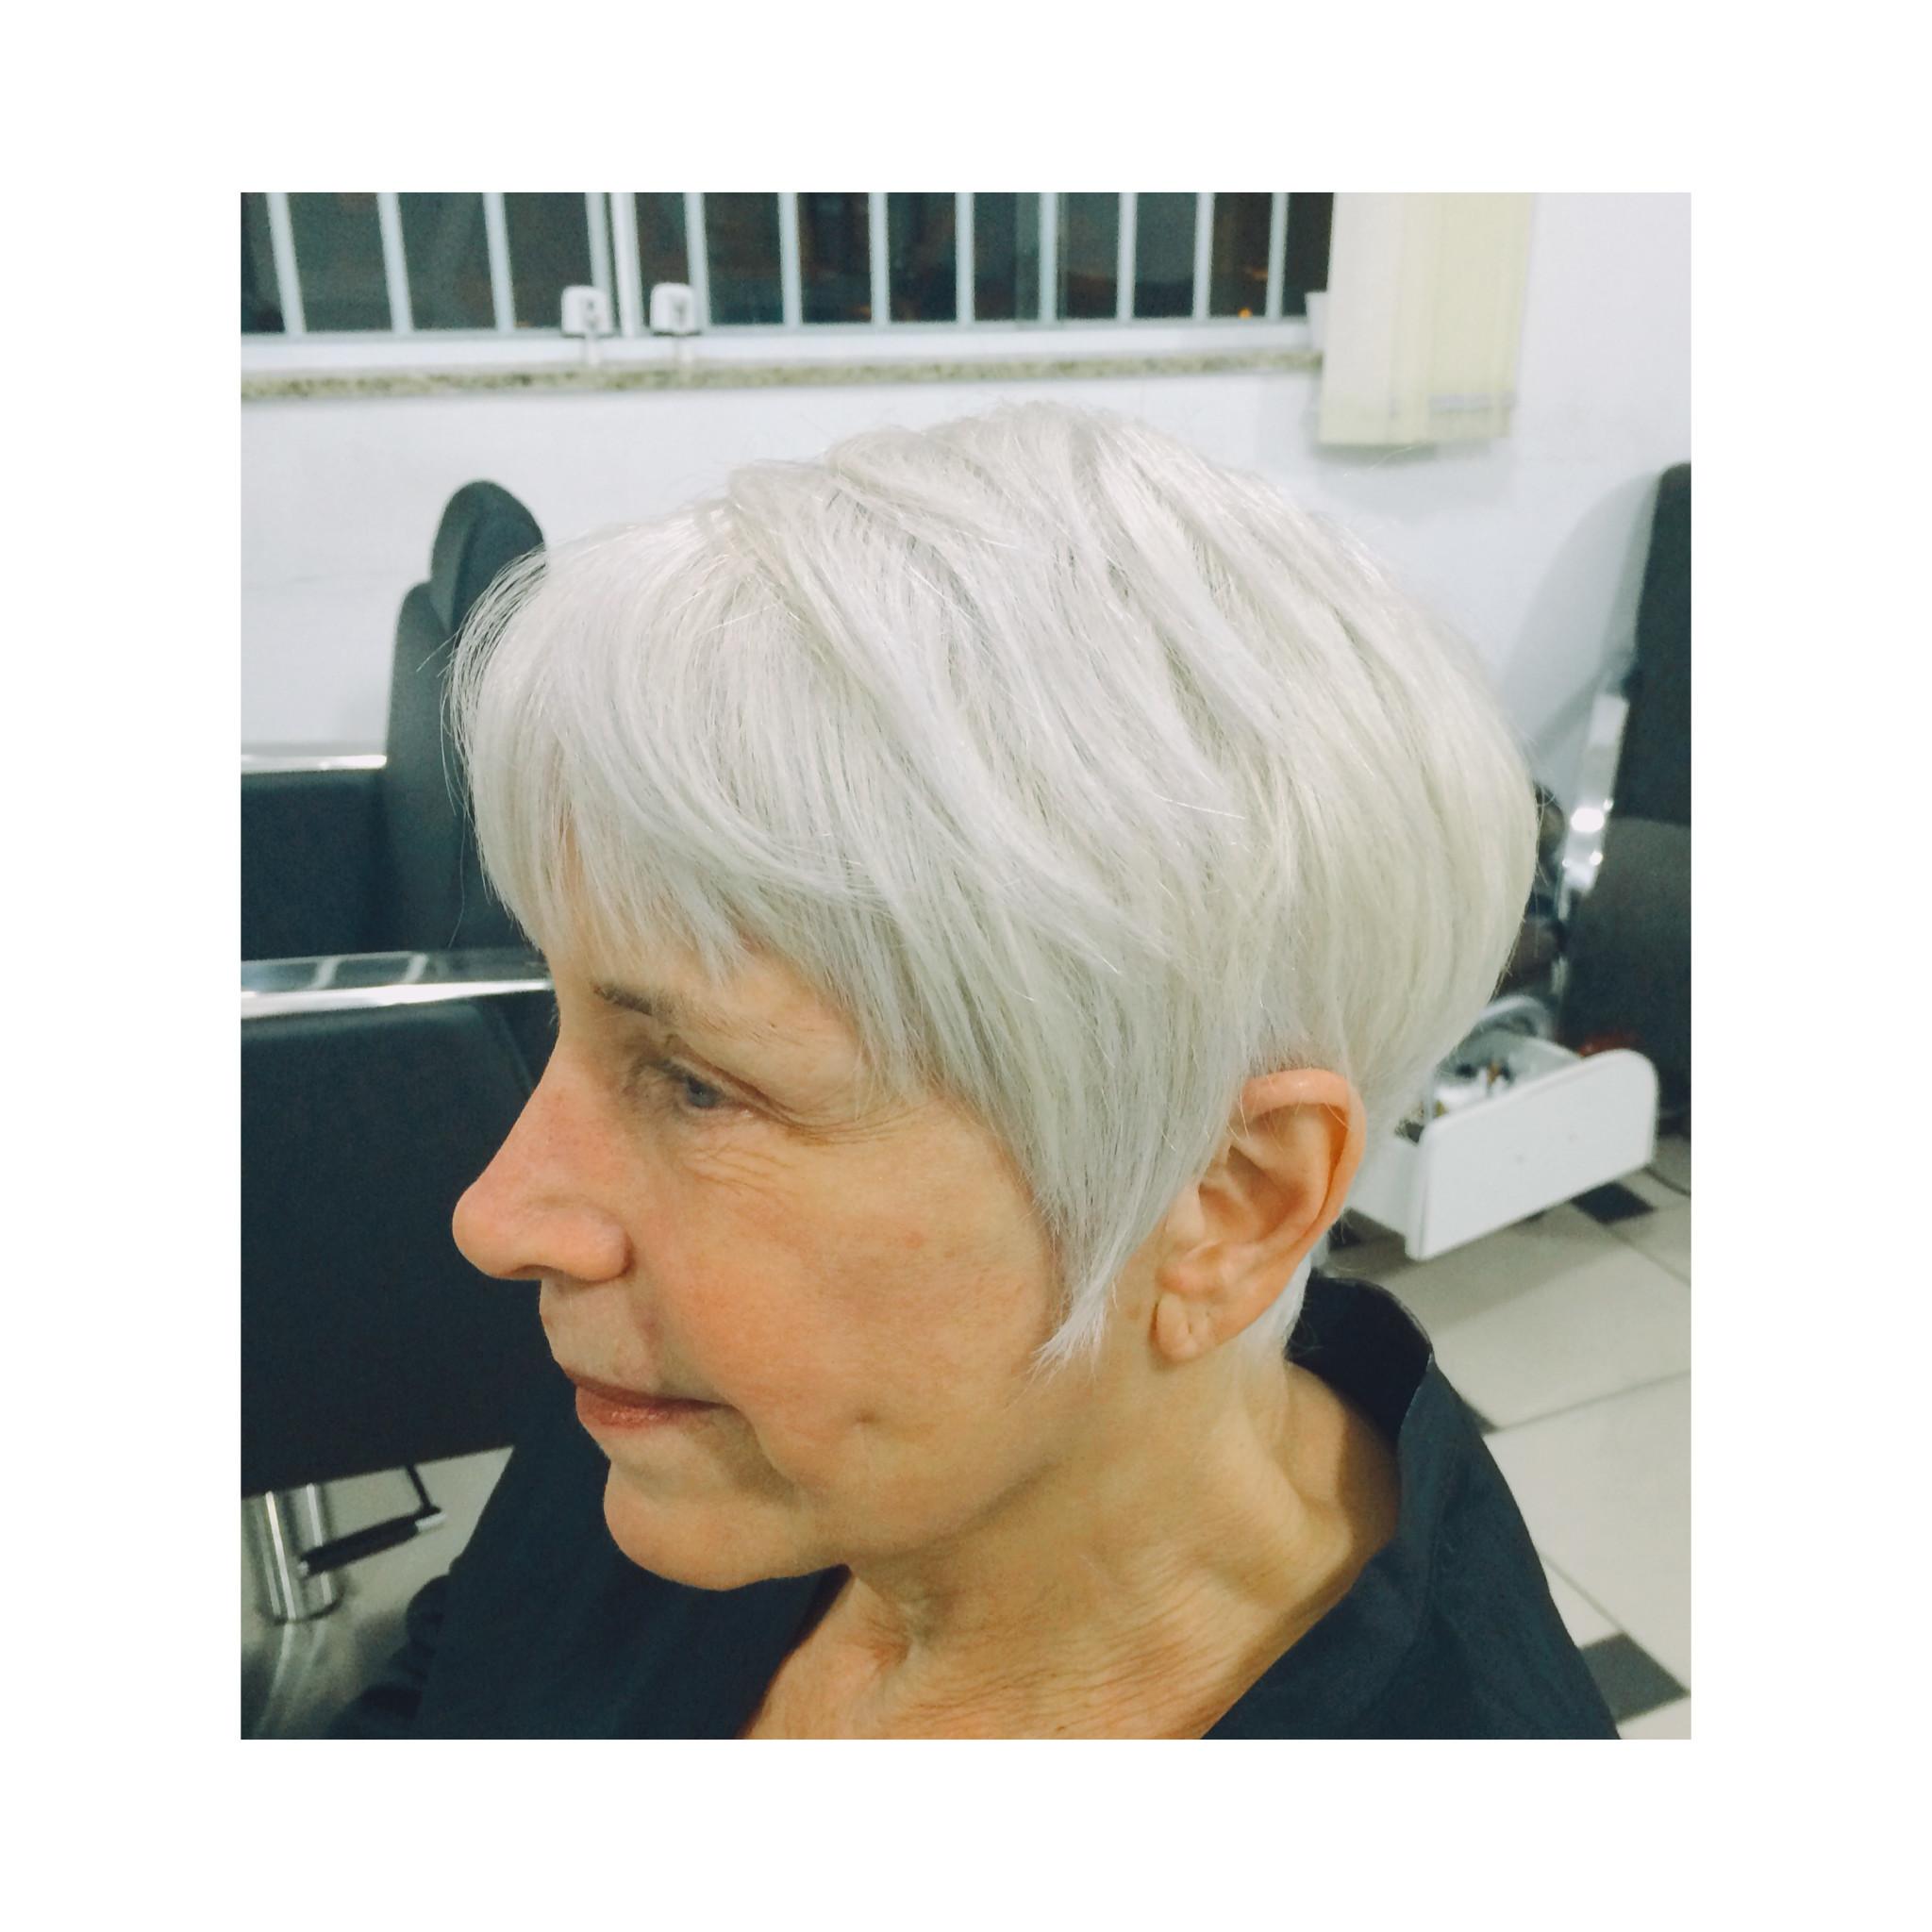 auxiliar cabeleireiro(a) cabeleireiro(a) escovista assistente maquiador(a) auxiliar cabeleireiro(a) cabeleireiro(a)